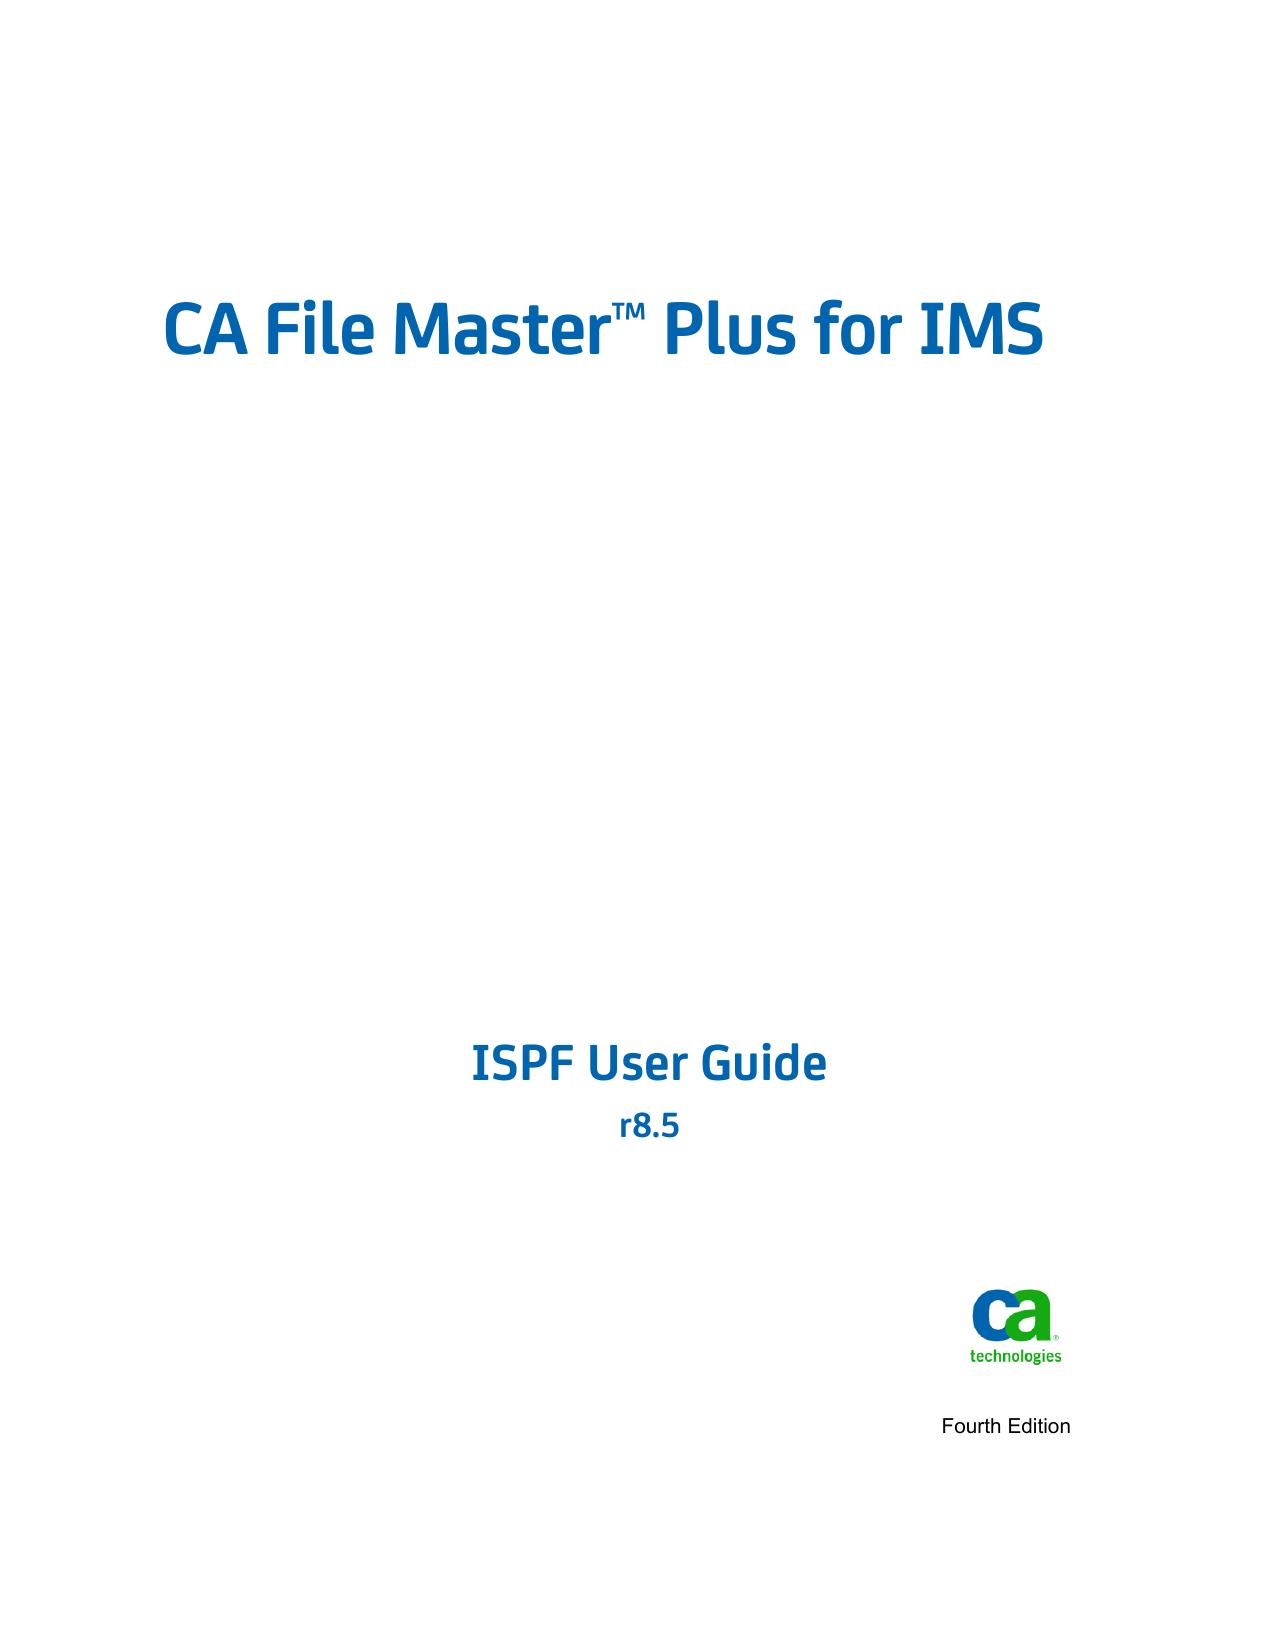 CA File Master Plus for IMS ISPF User Guide | manualzz com